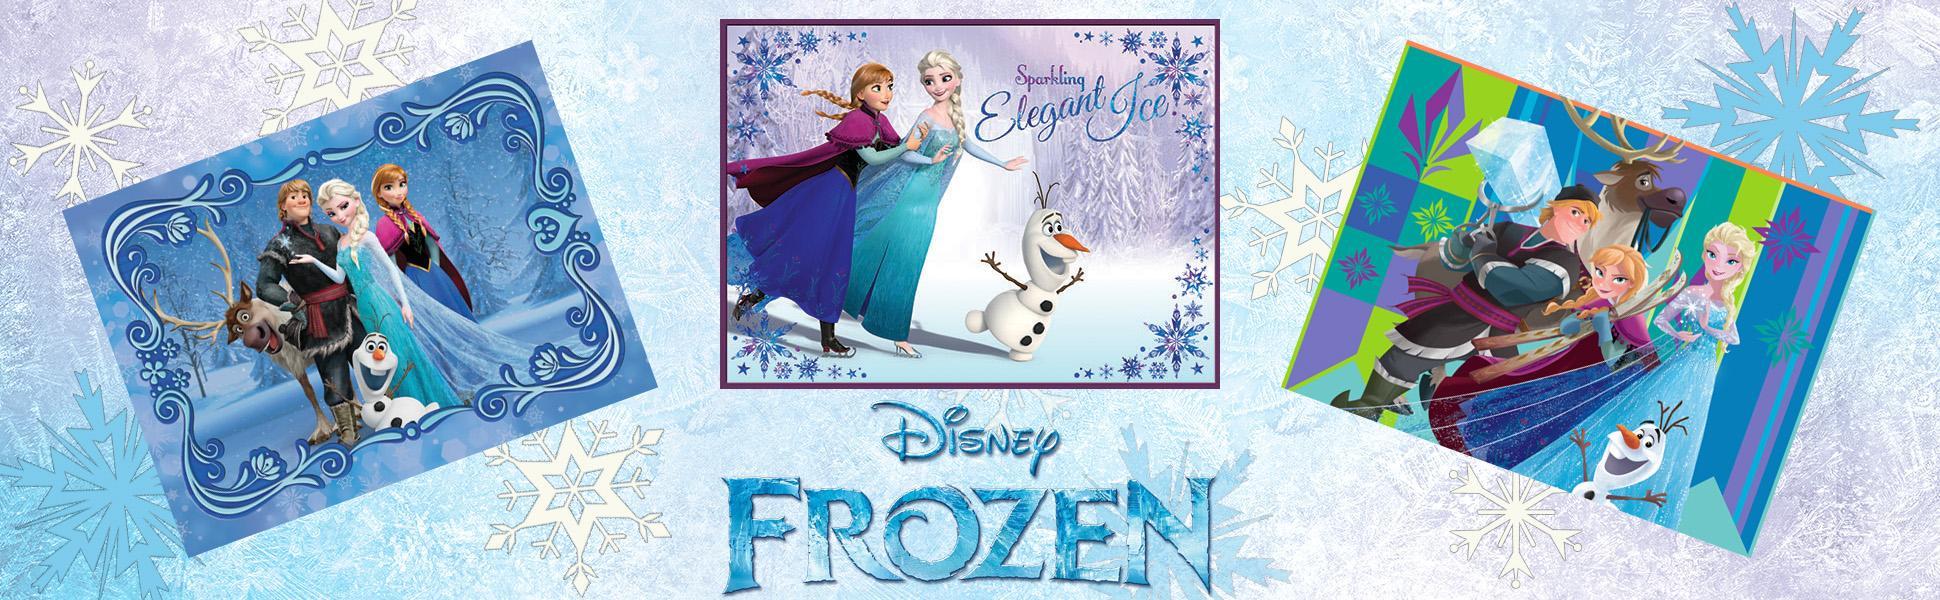 Amazon Com Gertmenian 31004 Disney Frozen Rug 2017 Look